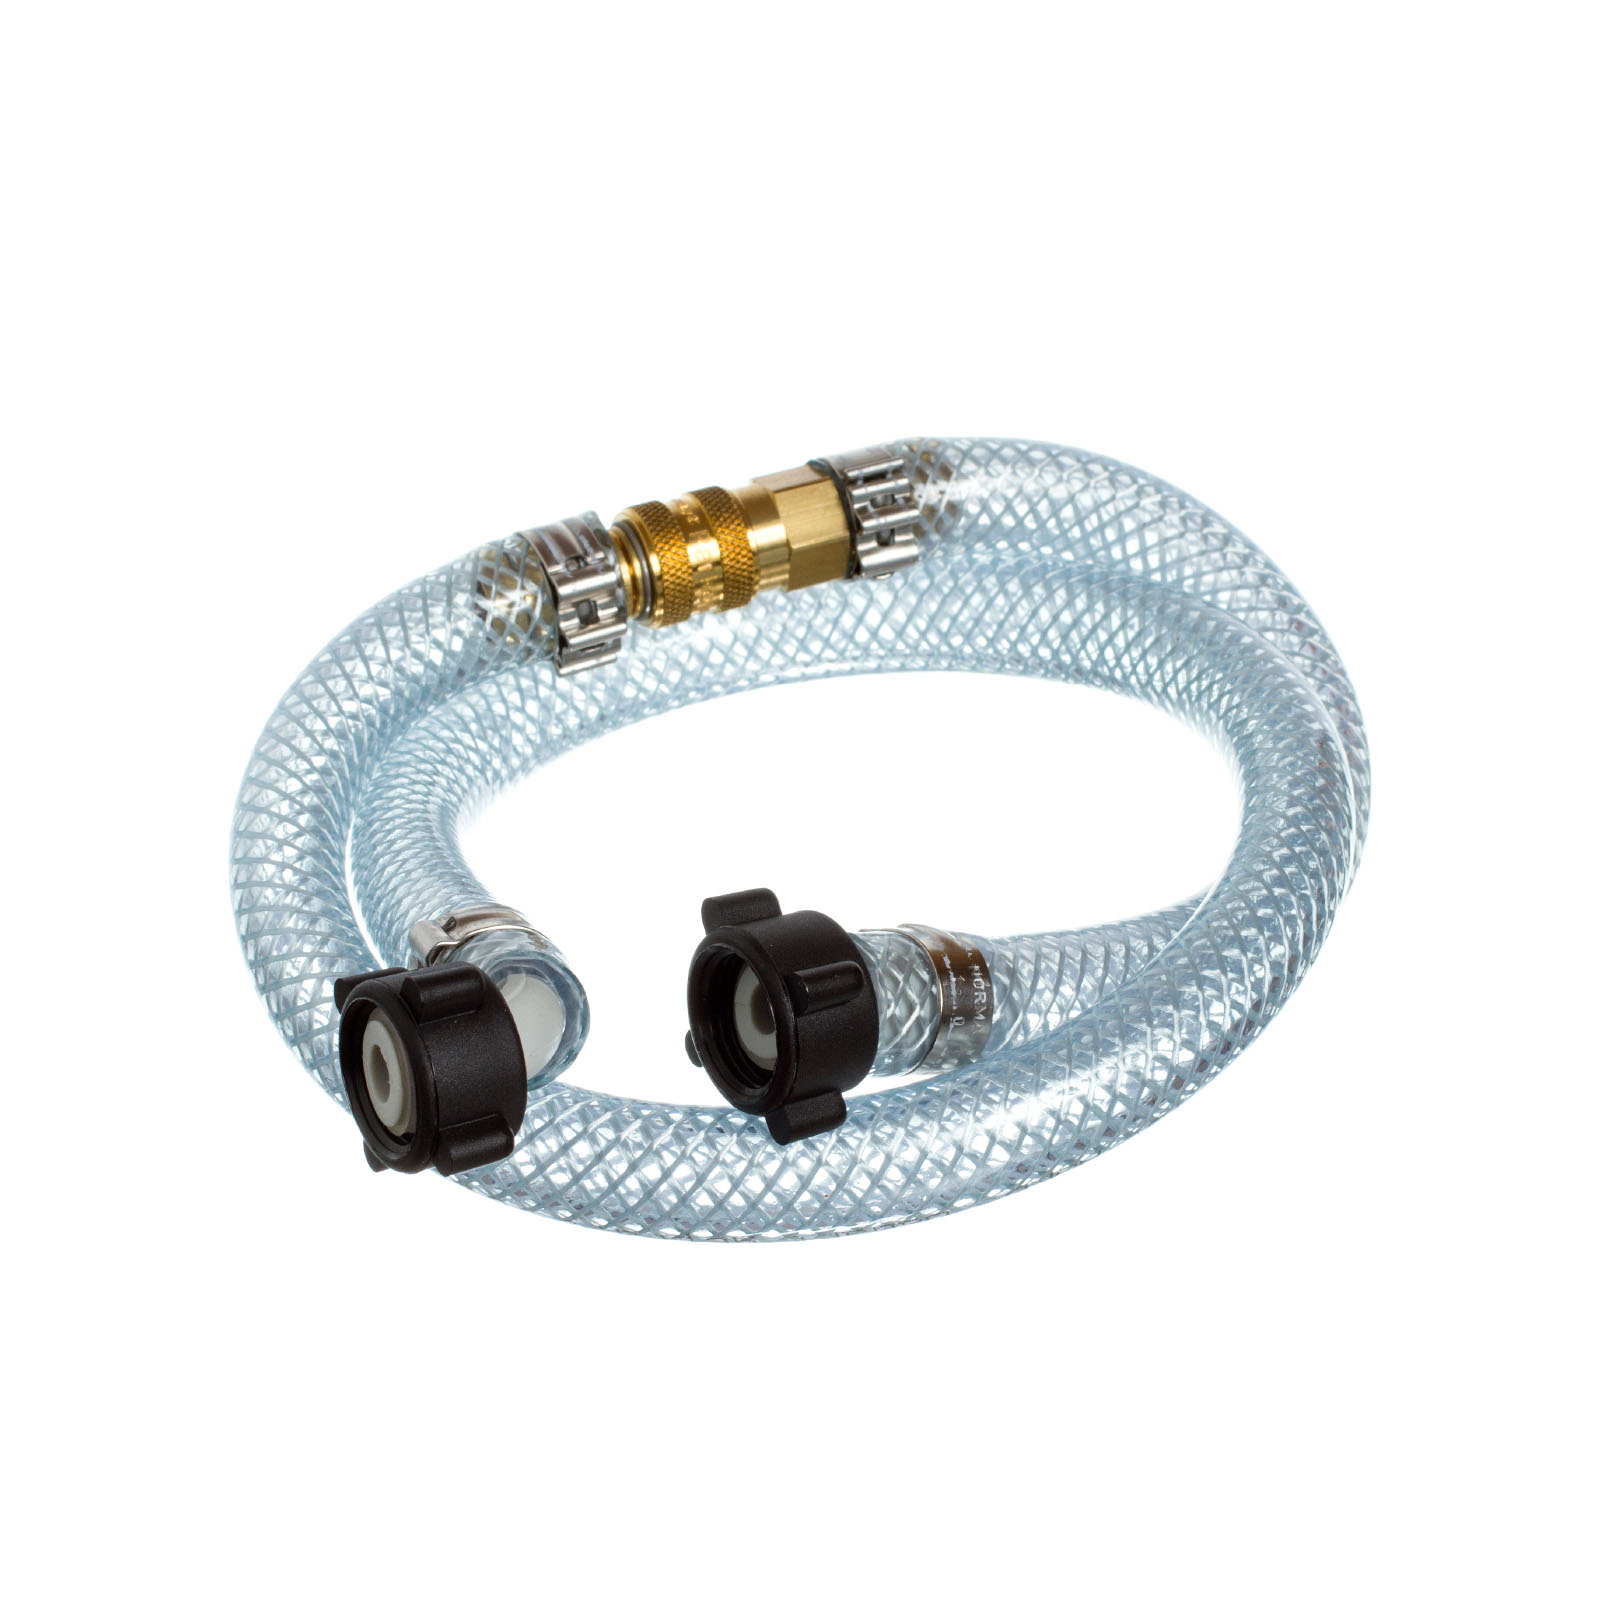 2012/1 Hadice přivodu vody - komplet s RS